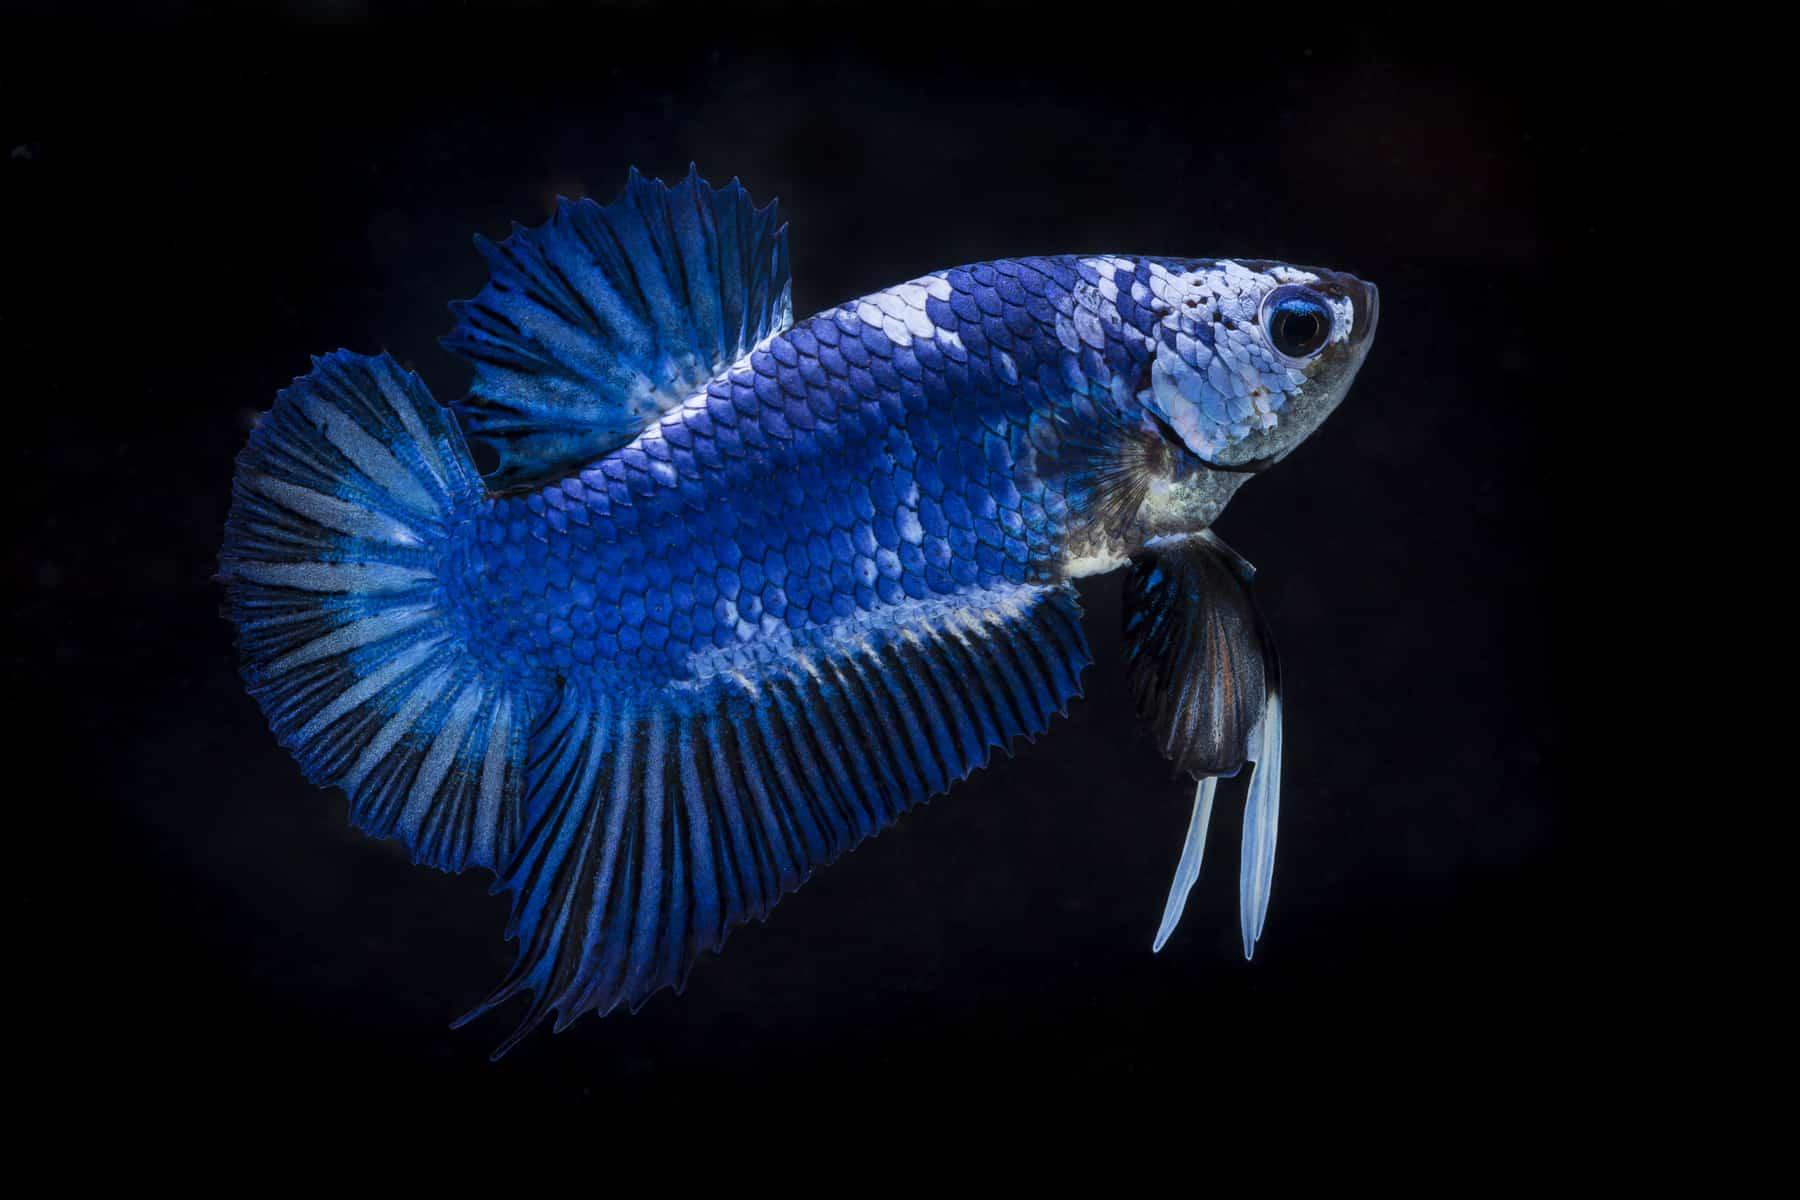 betta fish stripes in black background